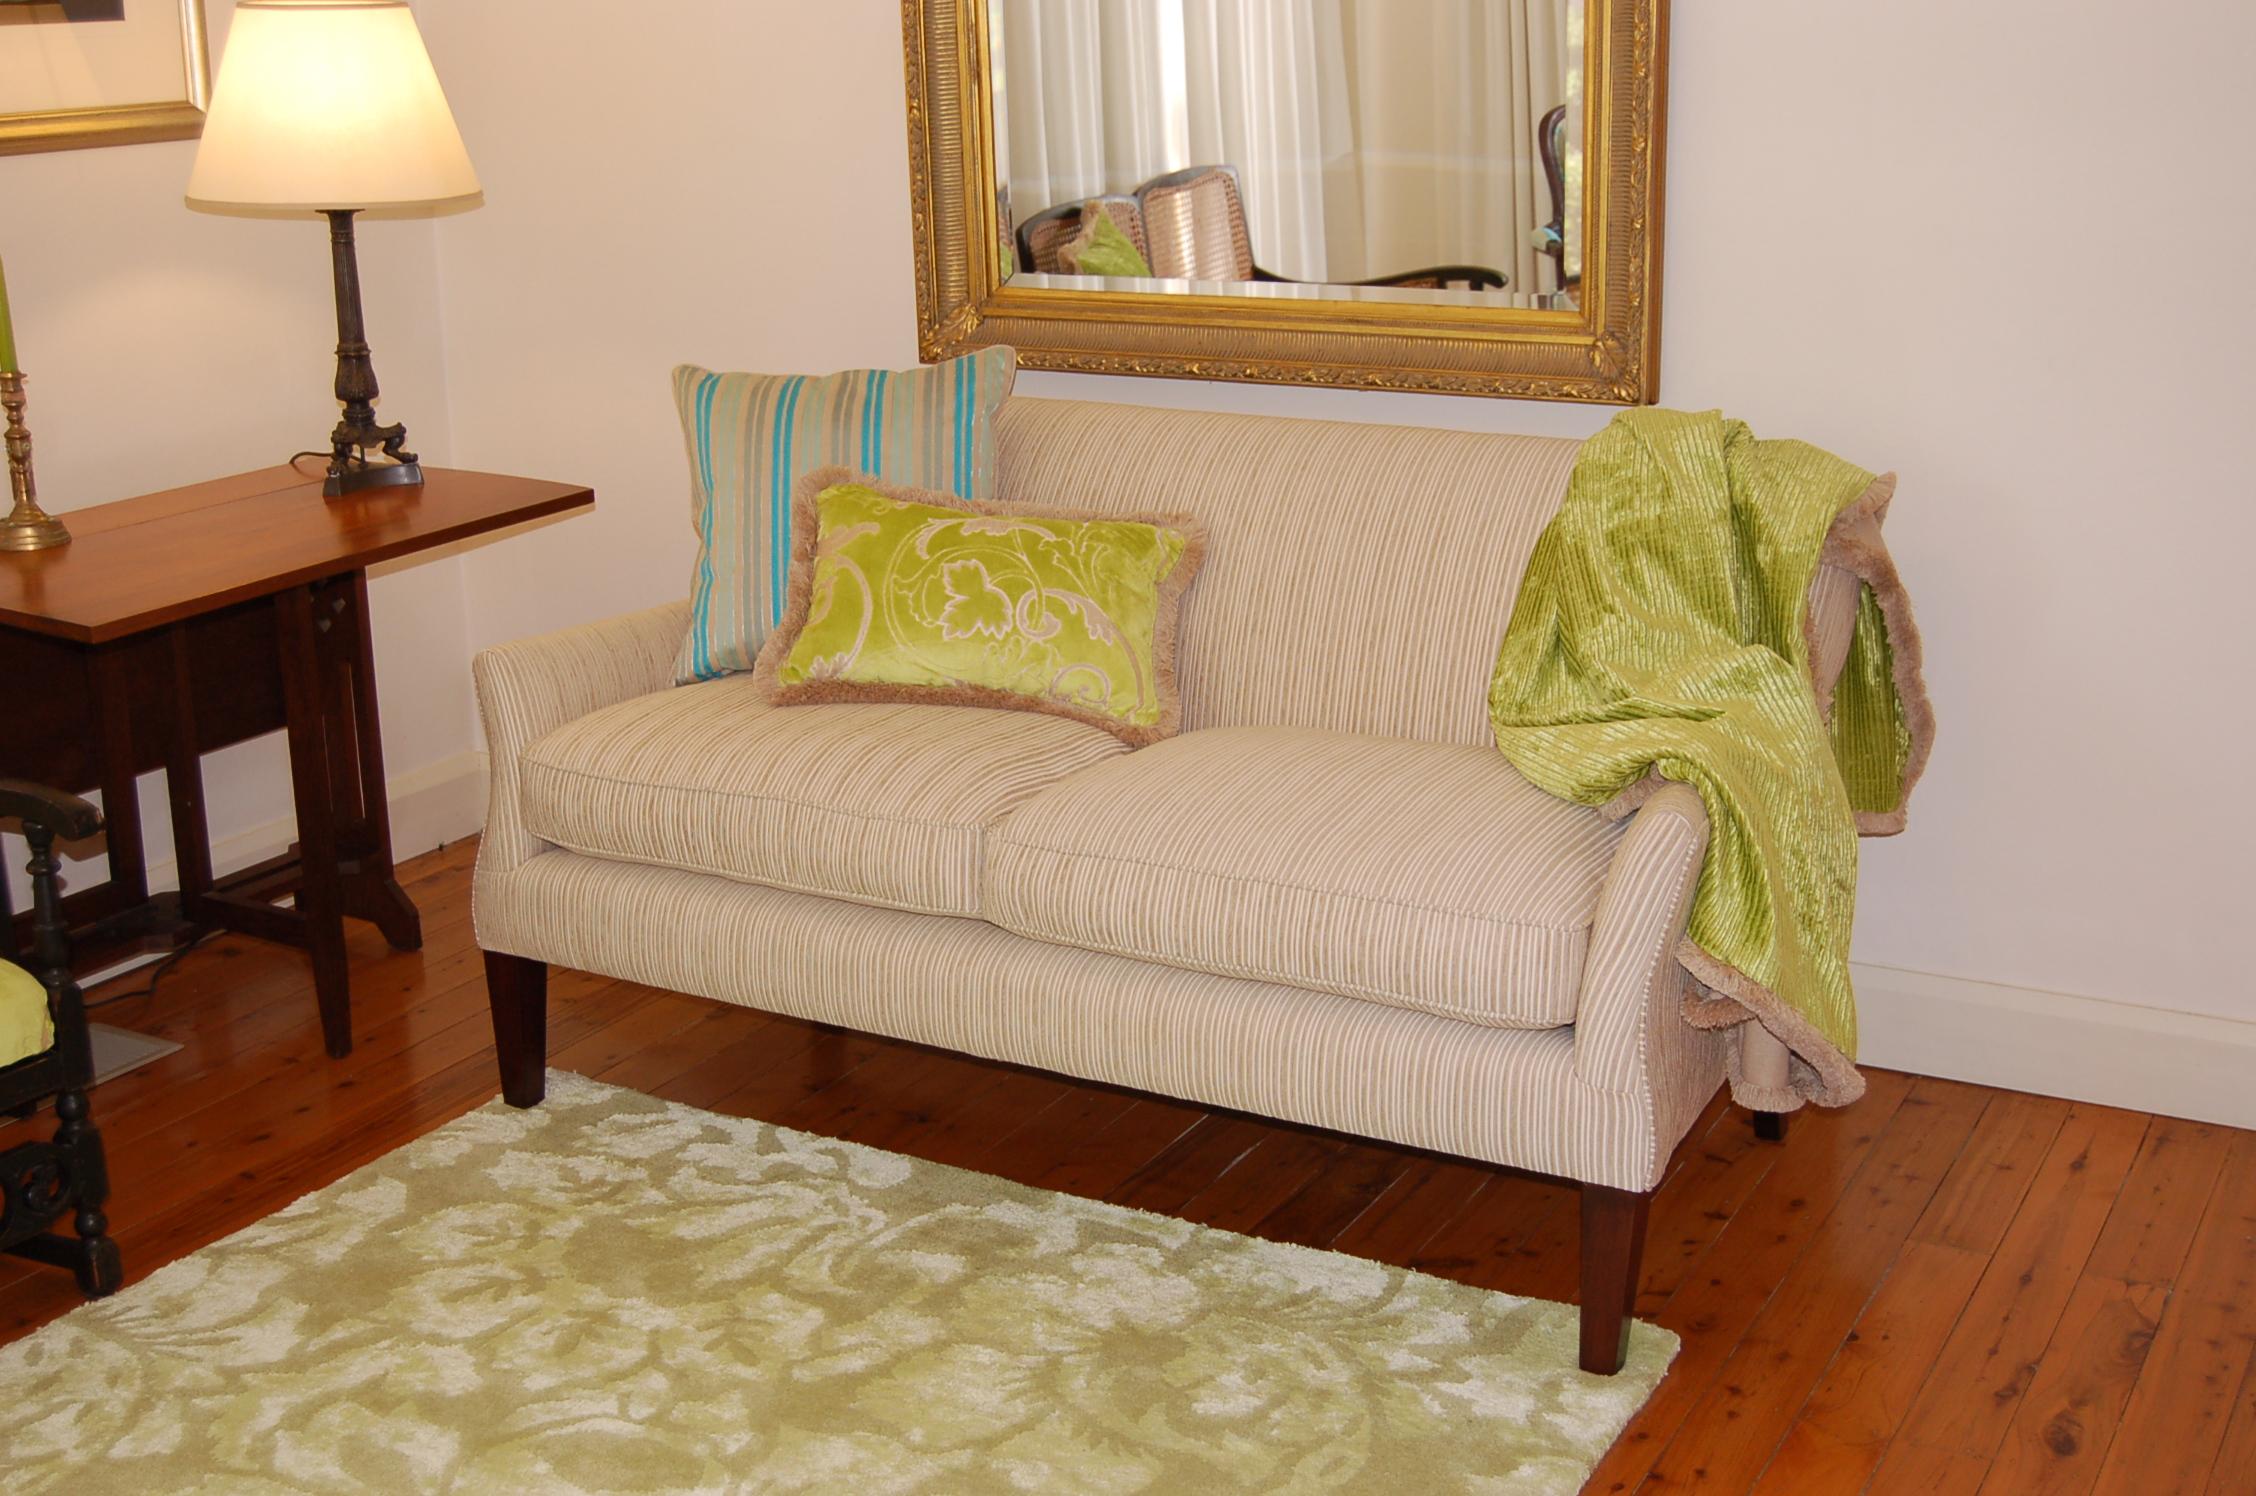 custom cushions and matching throw